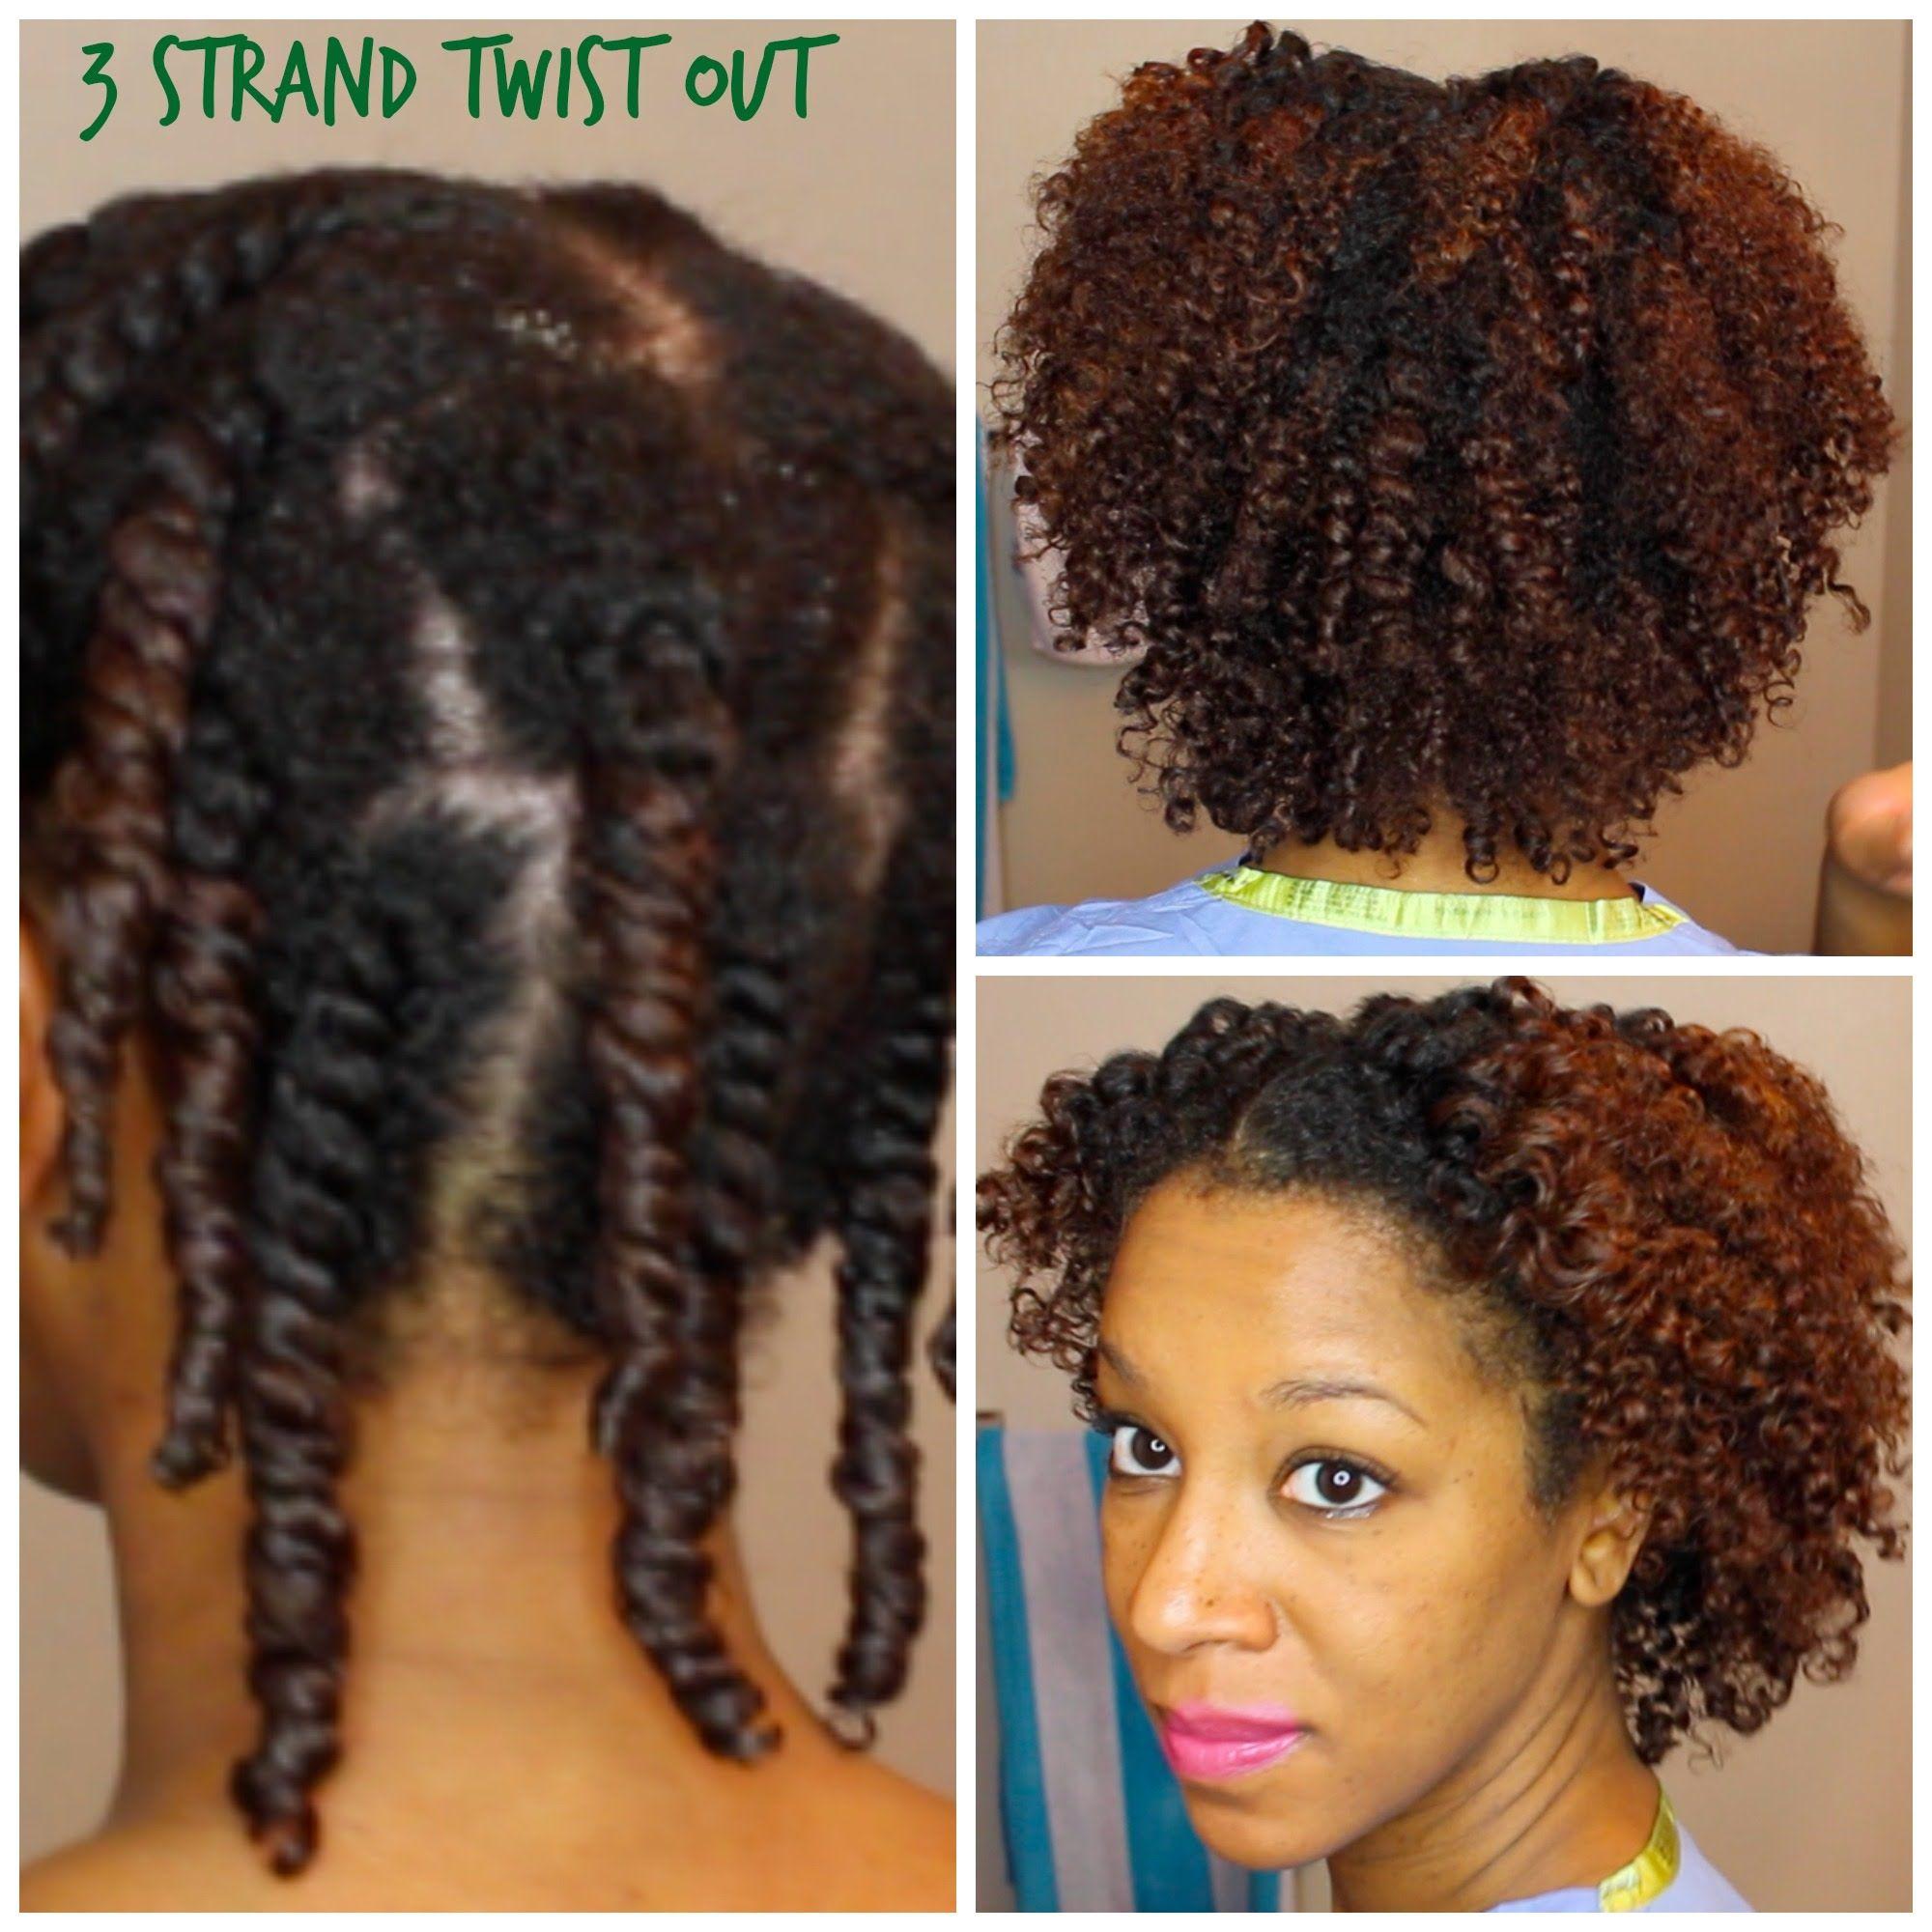 3 Strand Twist Out Heat Damaged Natural Hair Natural Hair